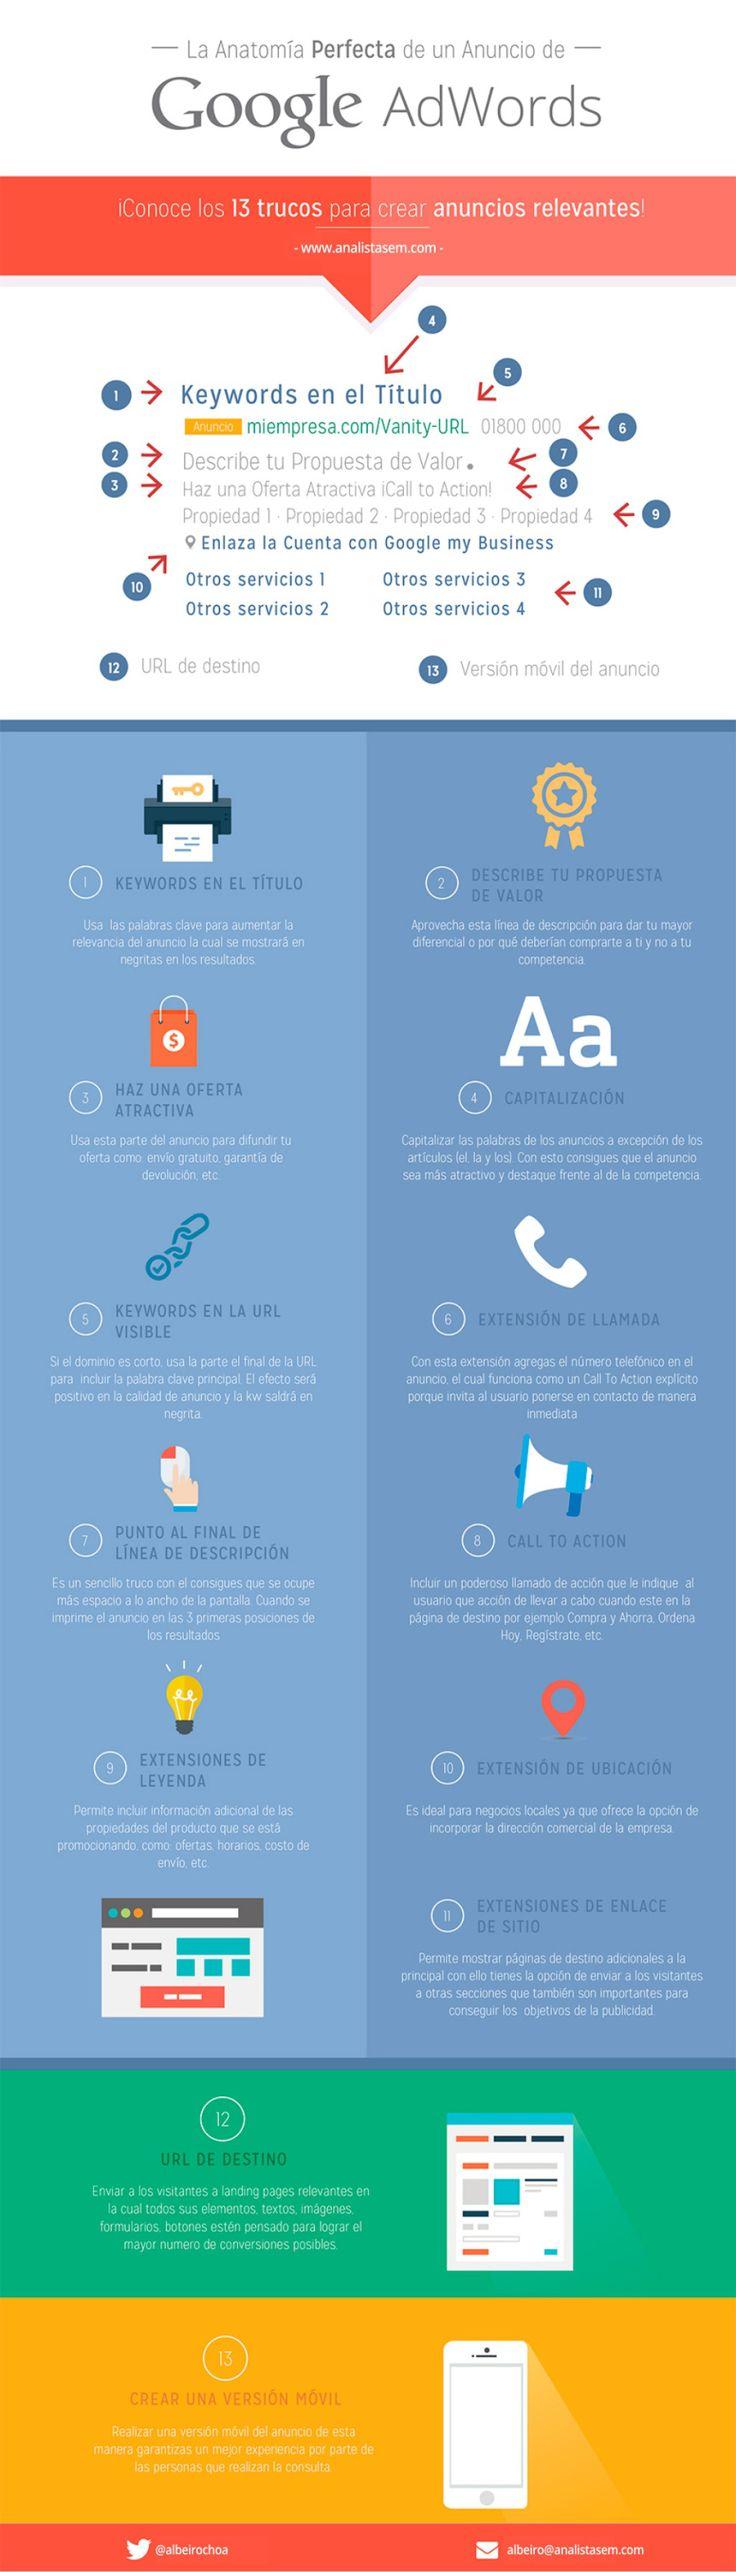 16 best Google Adwords images on Pinterest | Digital marketing ...